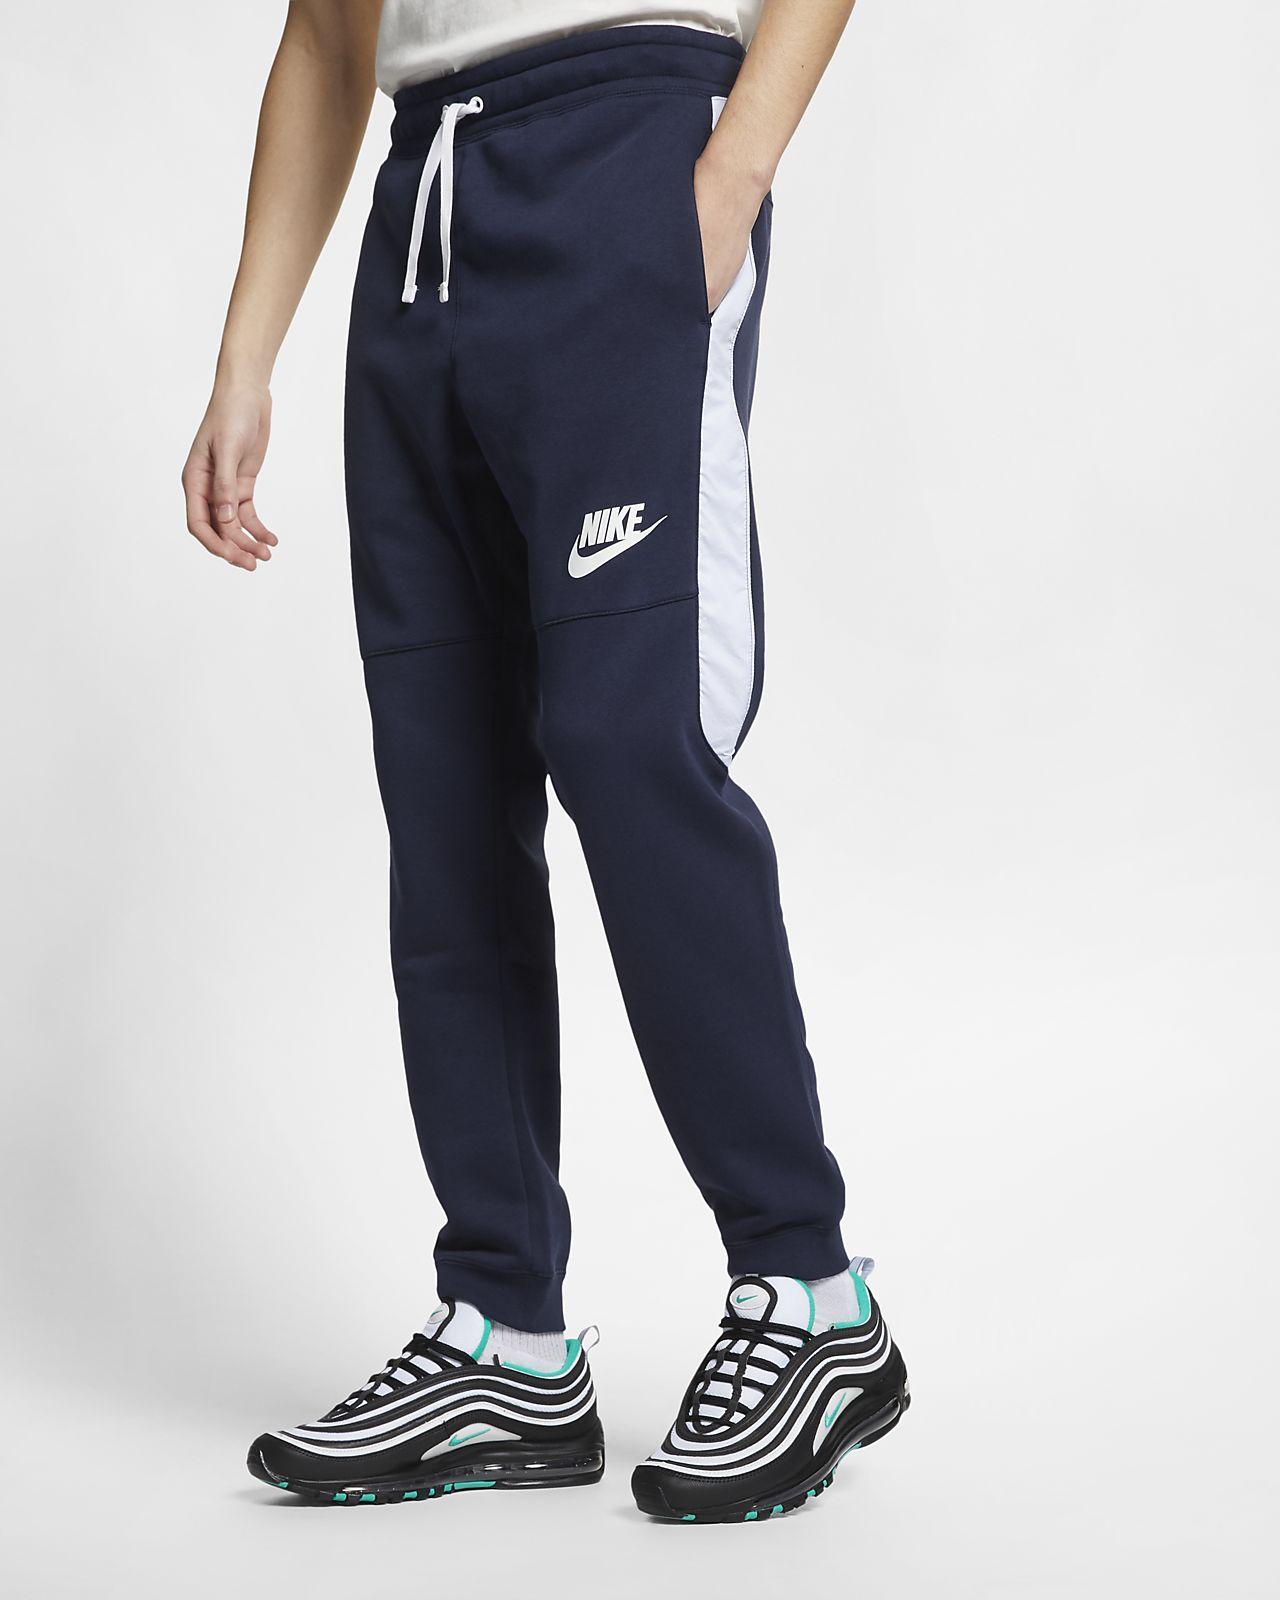 Pantalon Nike Pour Jogging De Sportswear Homme oCdexB